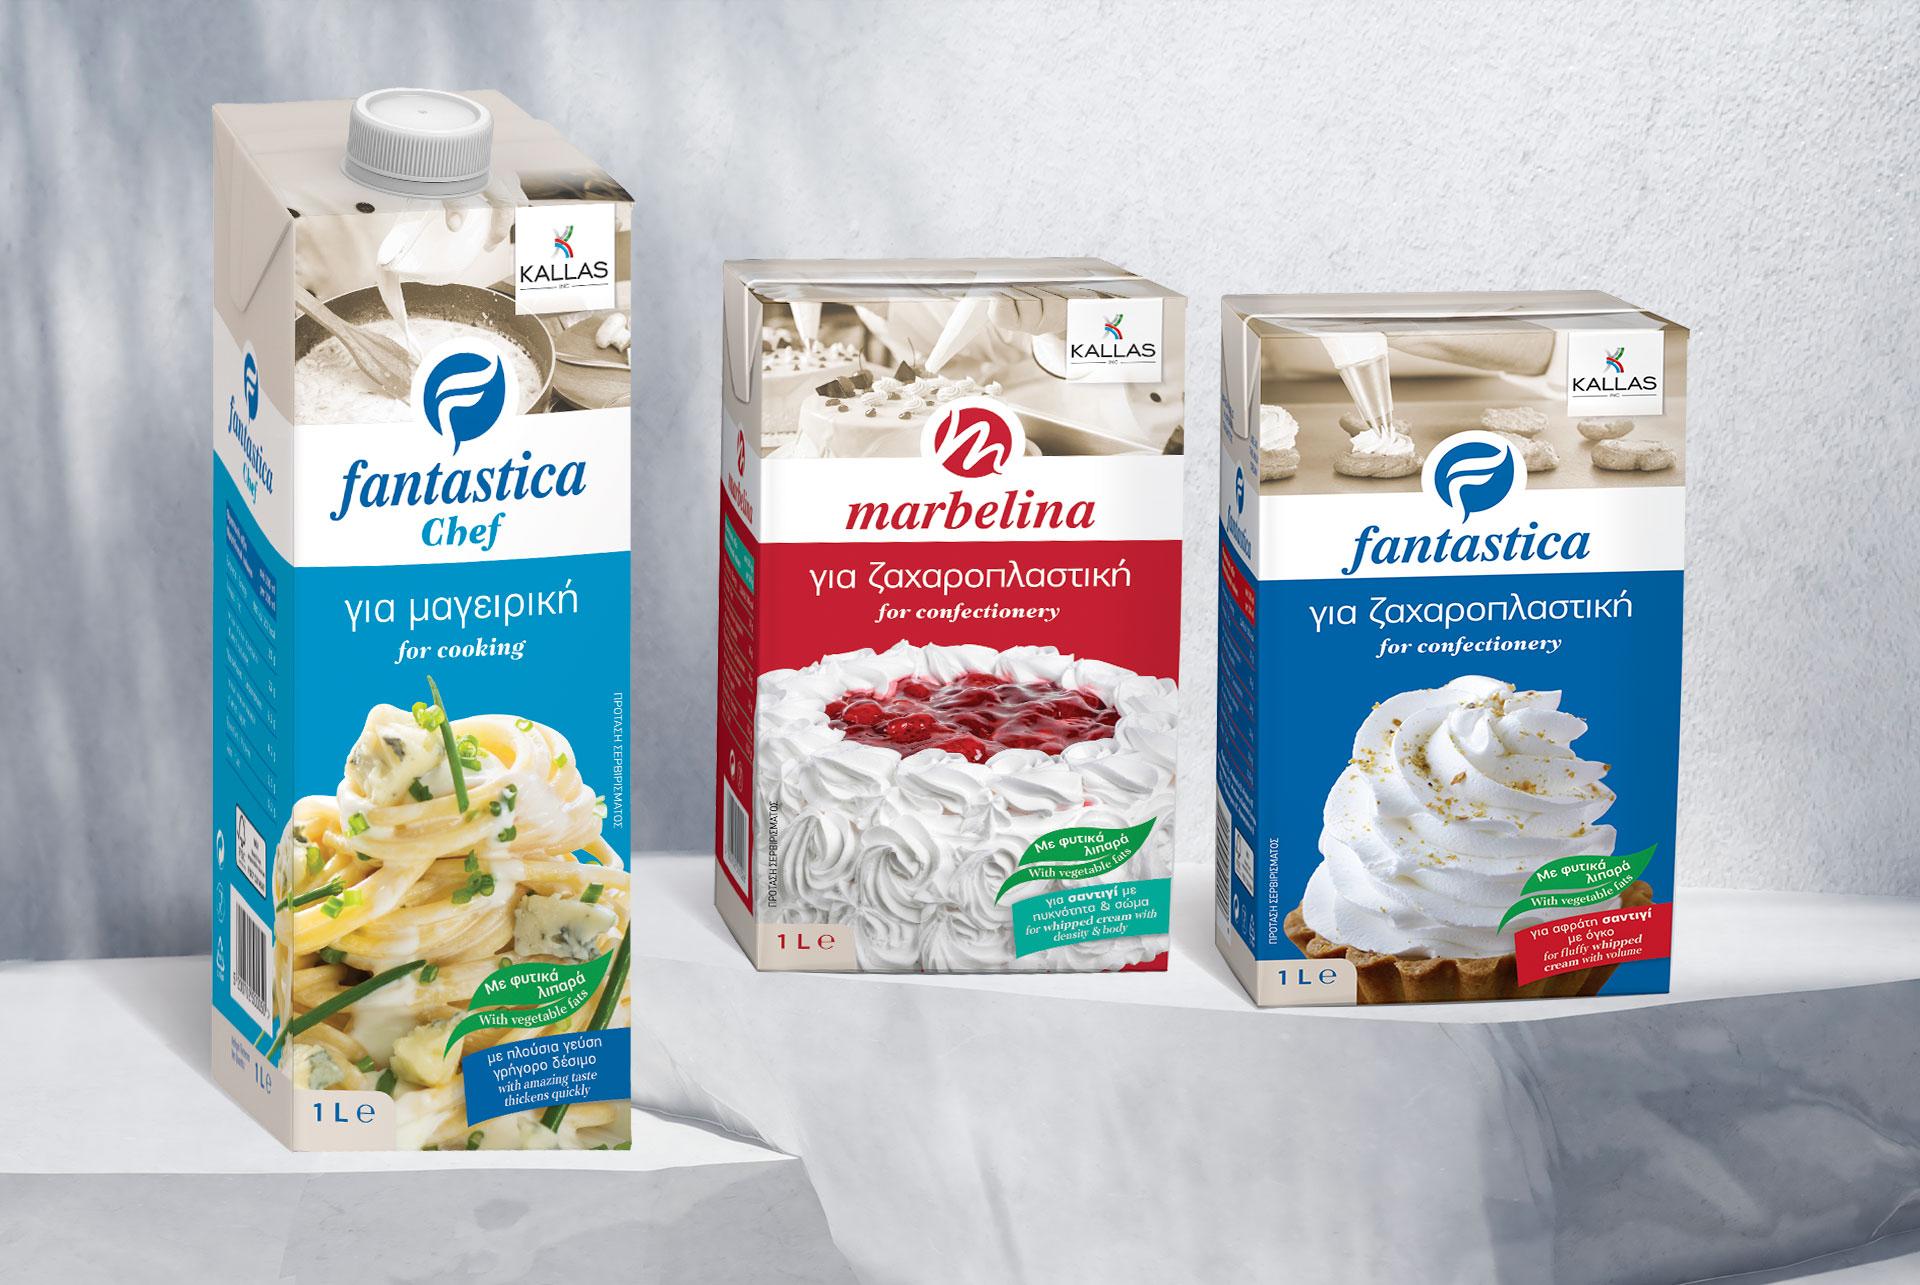 Fantastica & Marbelina Packaging